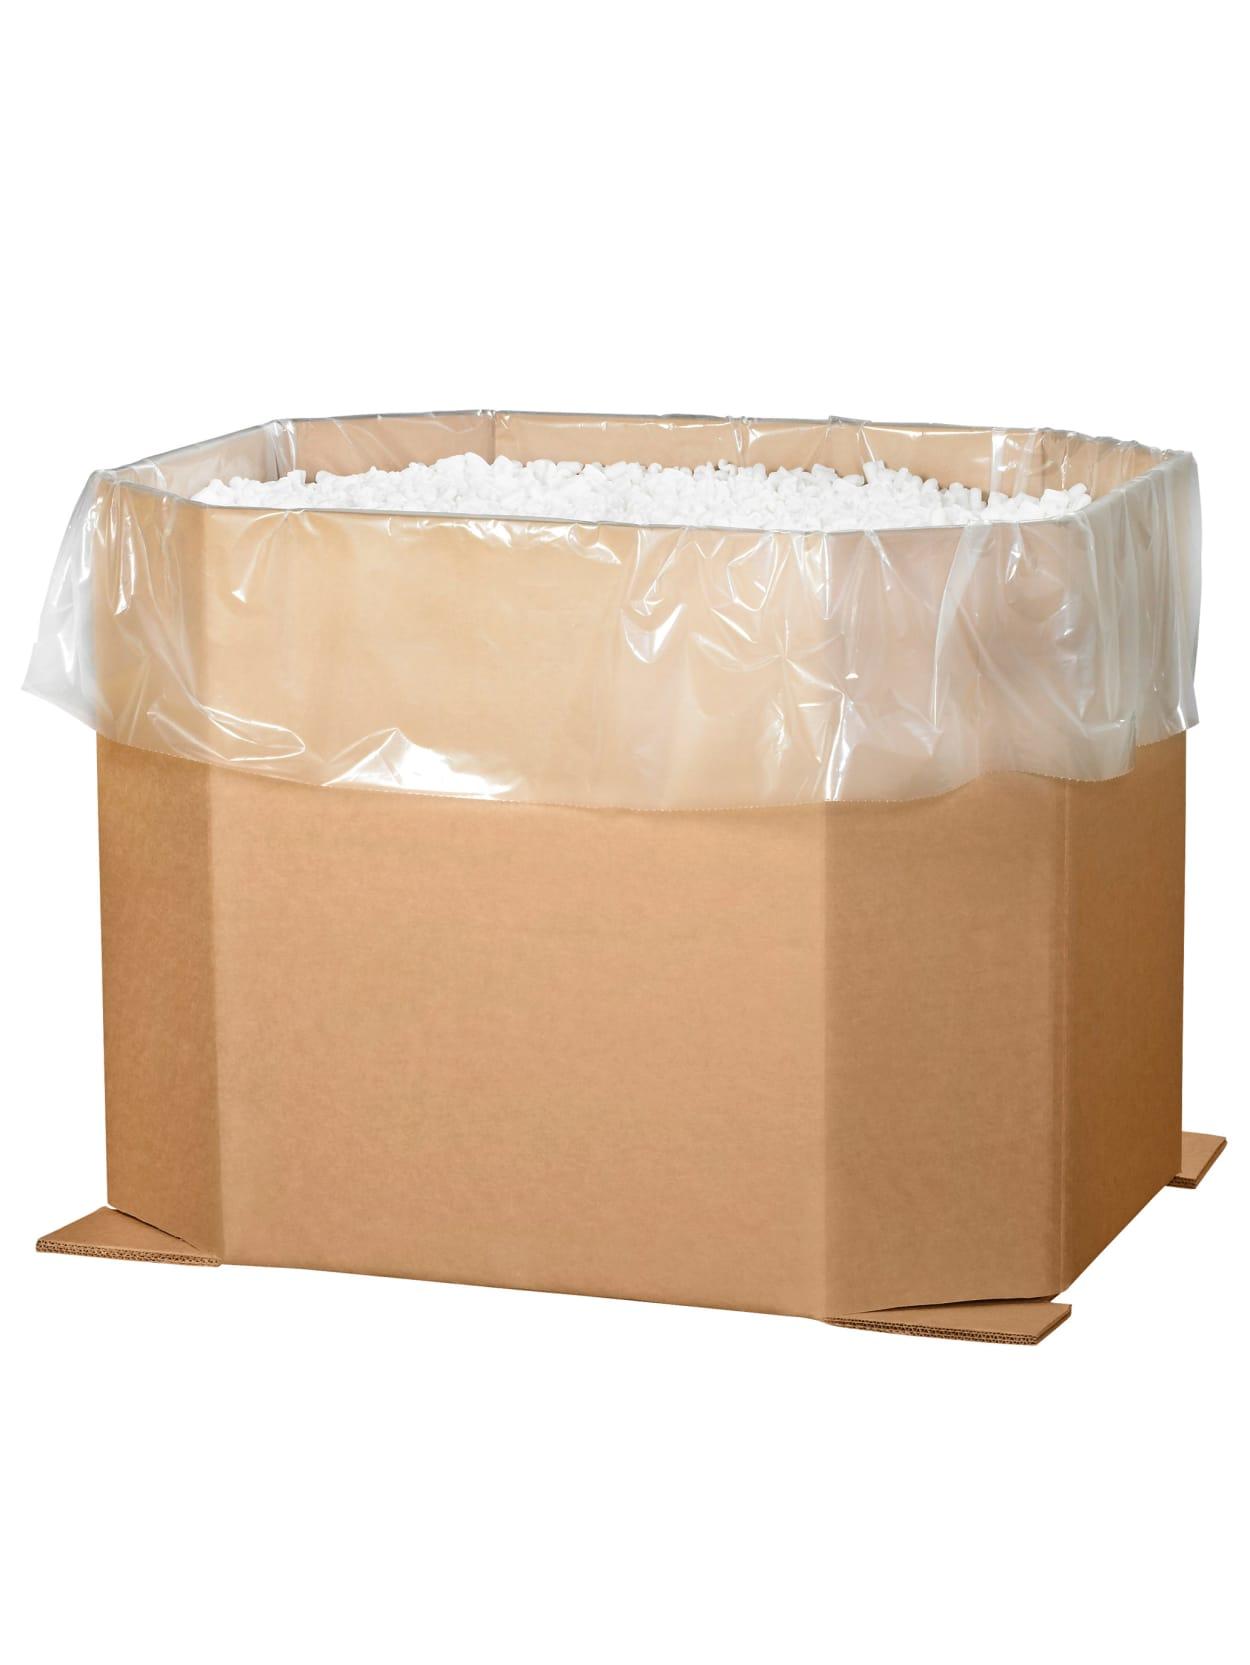 Office Depot Brand Heavy Duty Triple Wall Octagon Storage Box Bulk